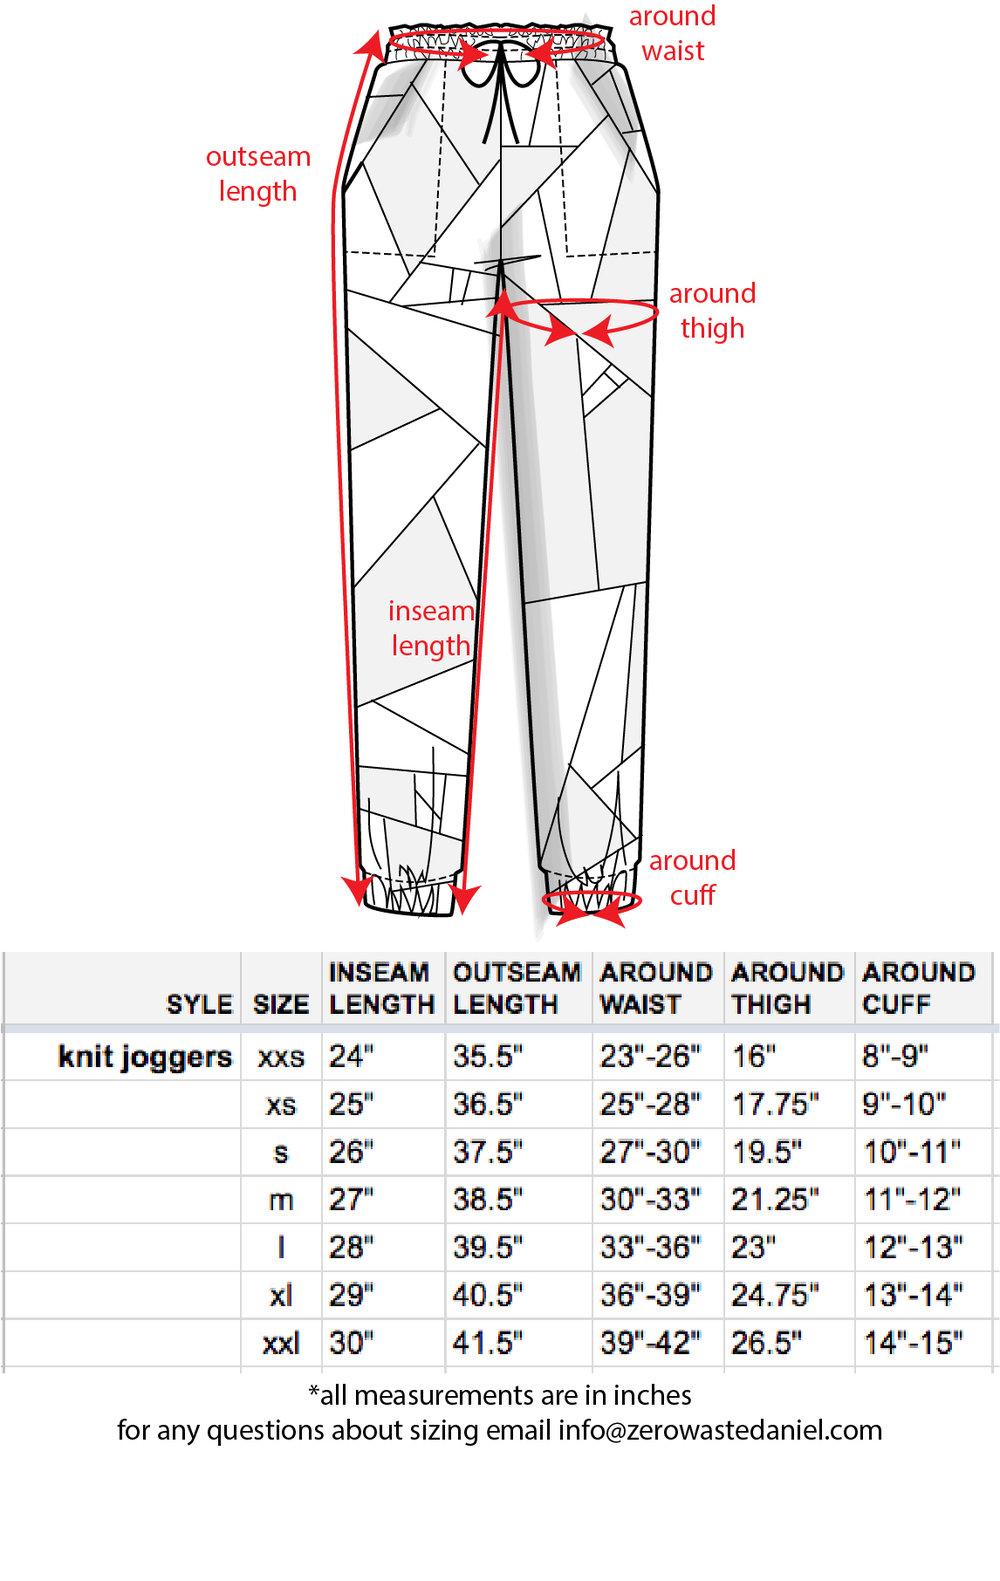 knit jogger size chart.jpg